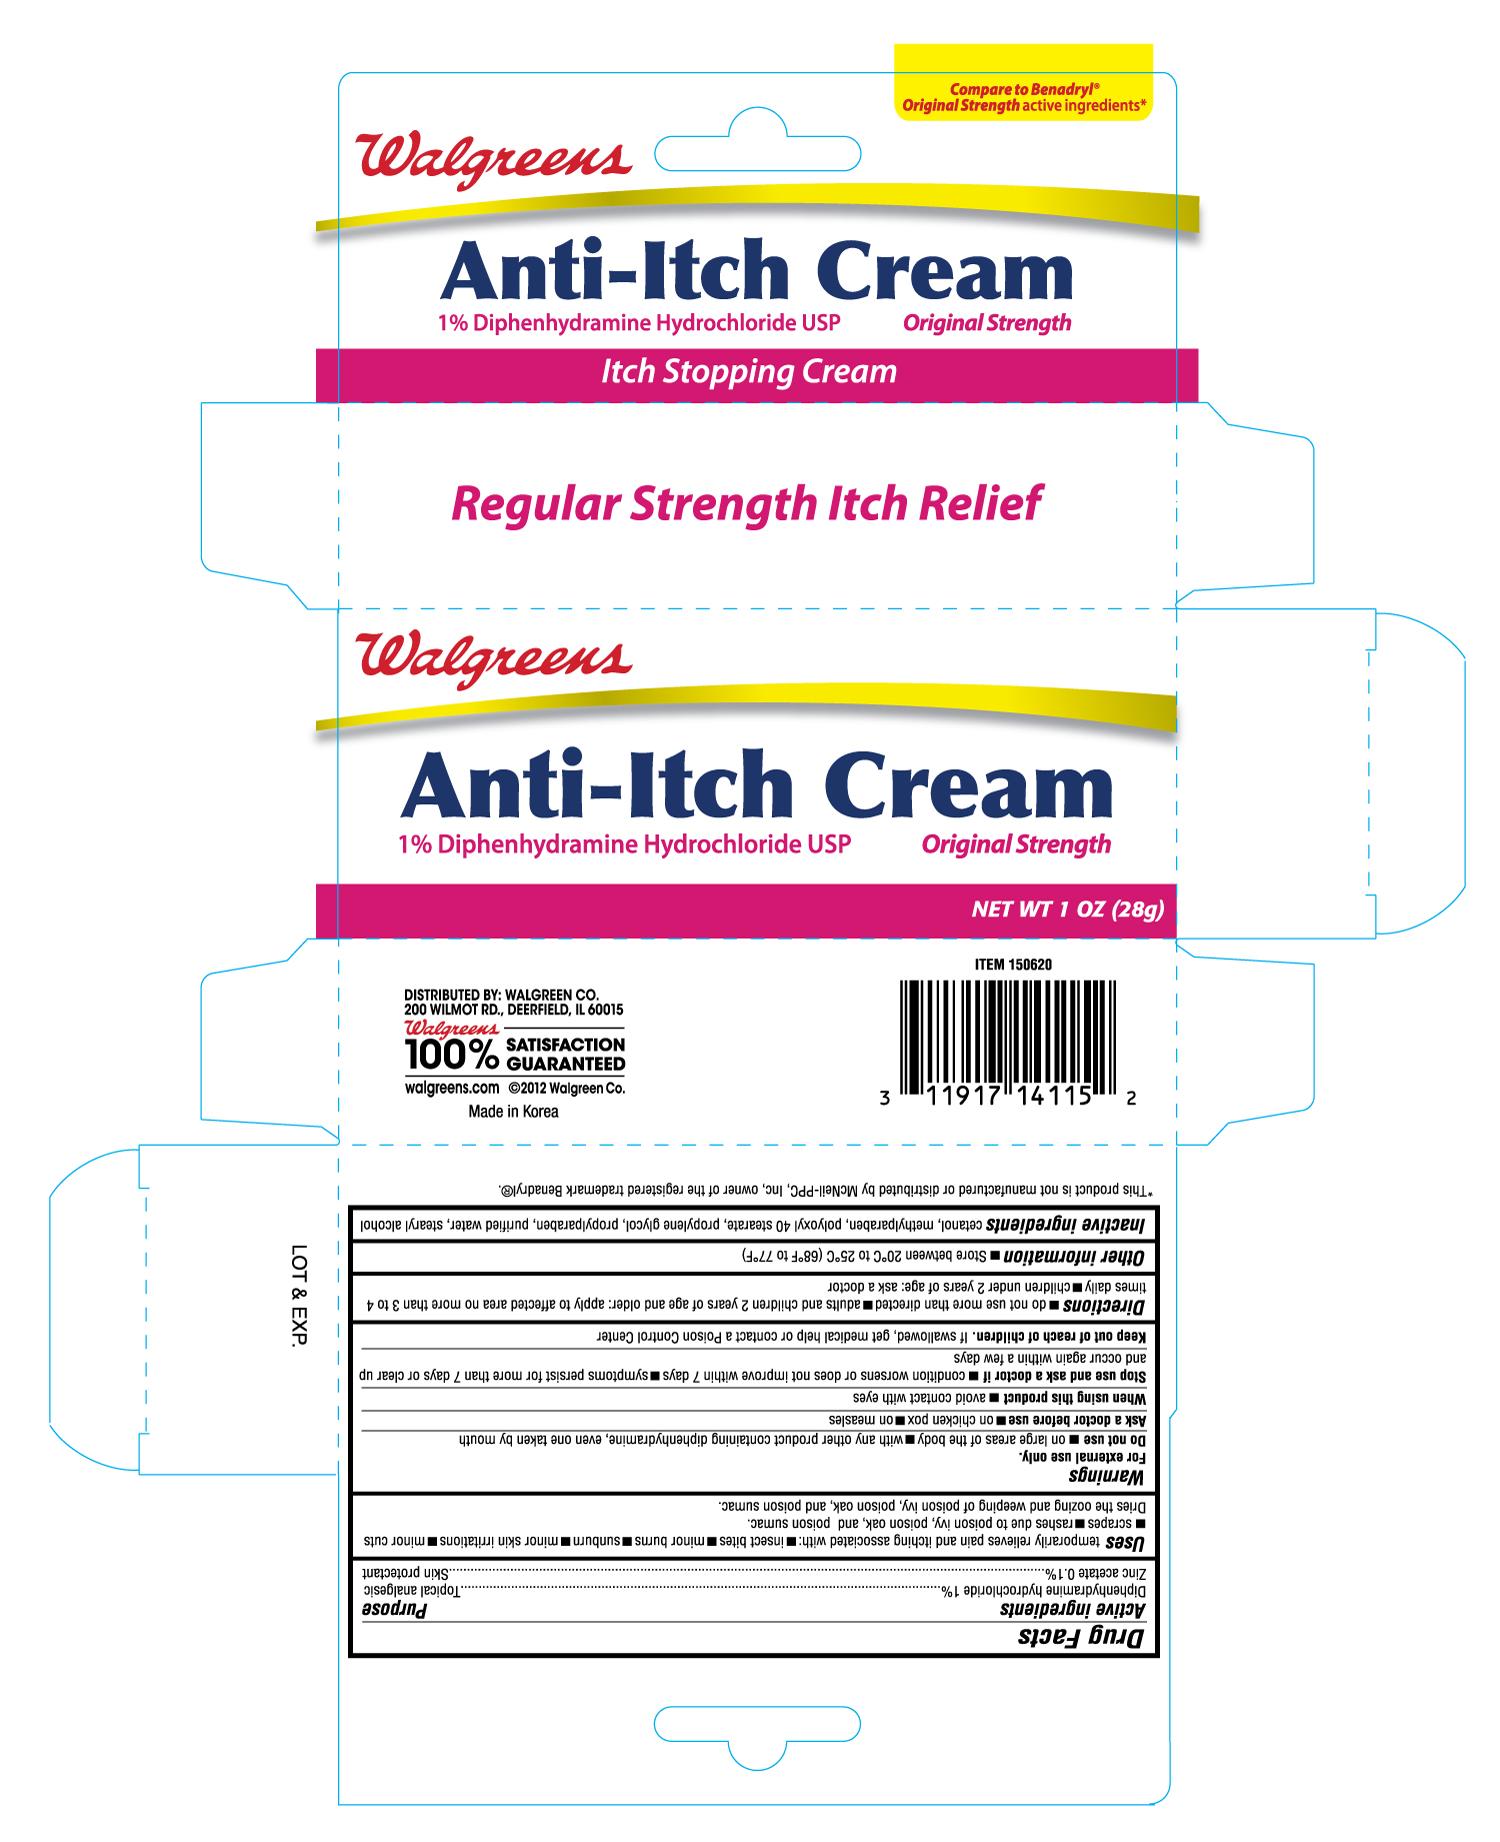 Walgreens Anti Itch (Diphenhydramine Hydrochloride, Zinc Acetate) Cream [Walgreen Company]